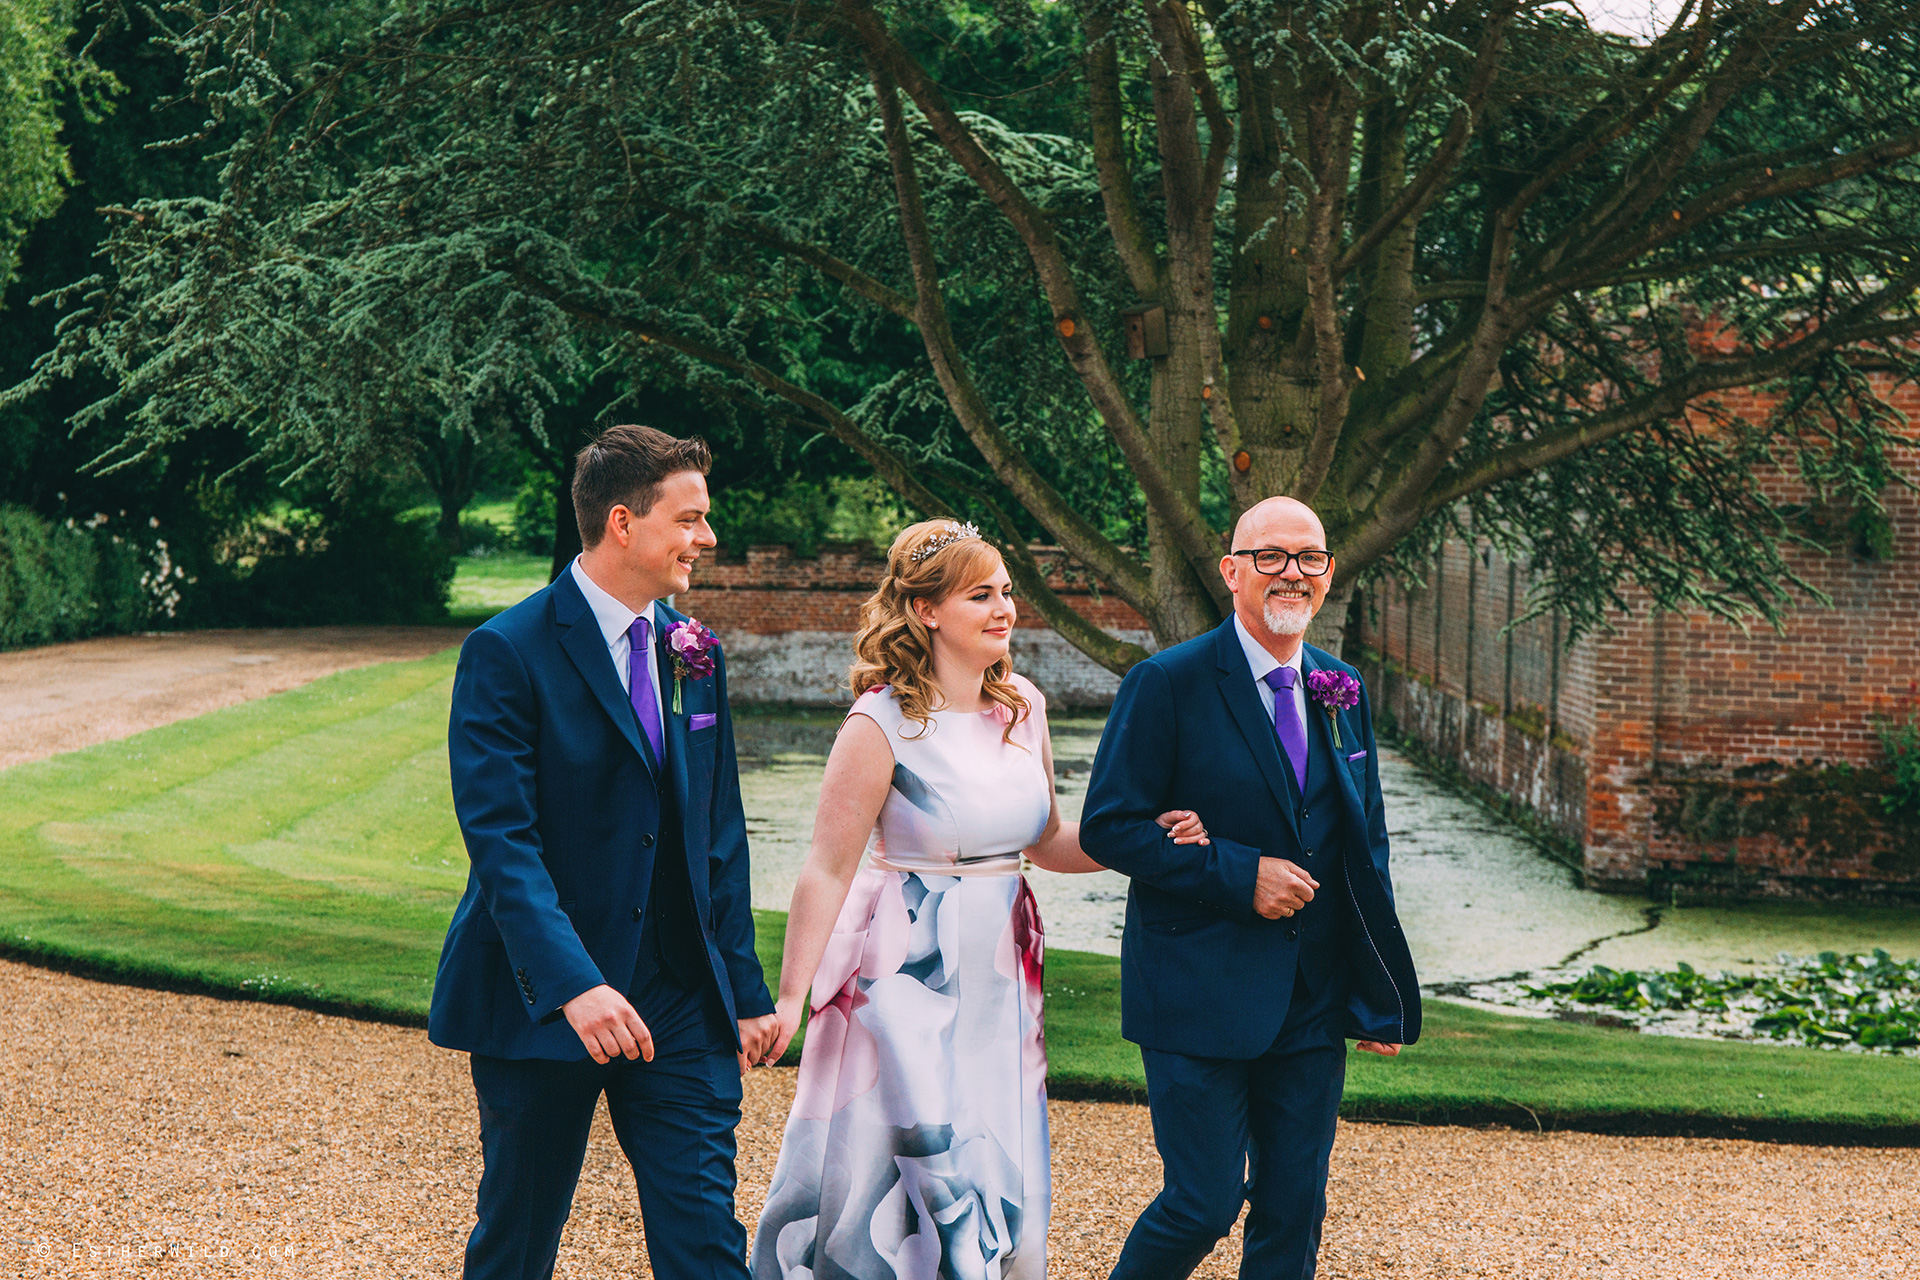 Norfolk_Wedding_Photographer_Mannington_Hall_Country_Esther_Wild_0038.jpg